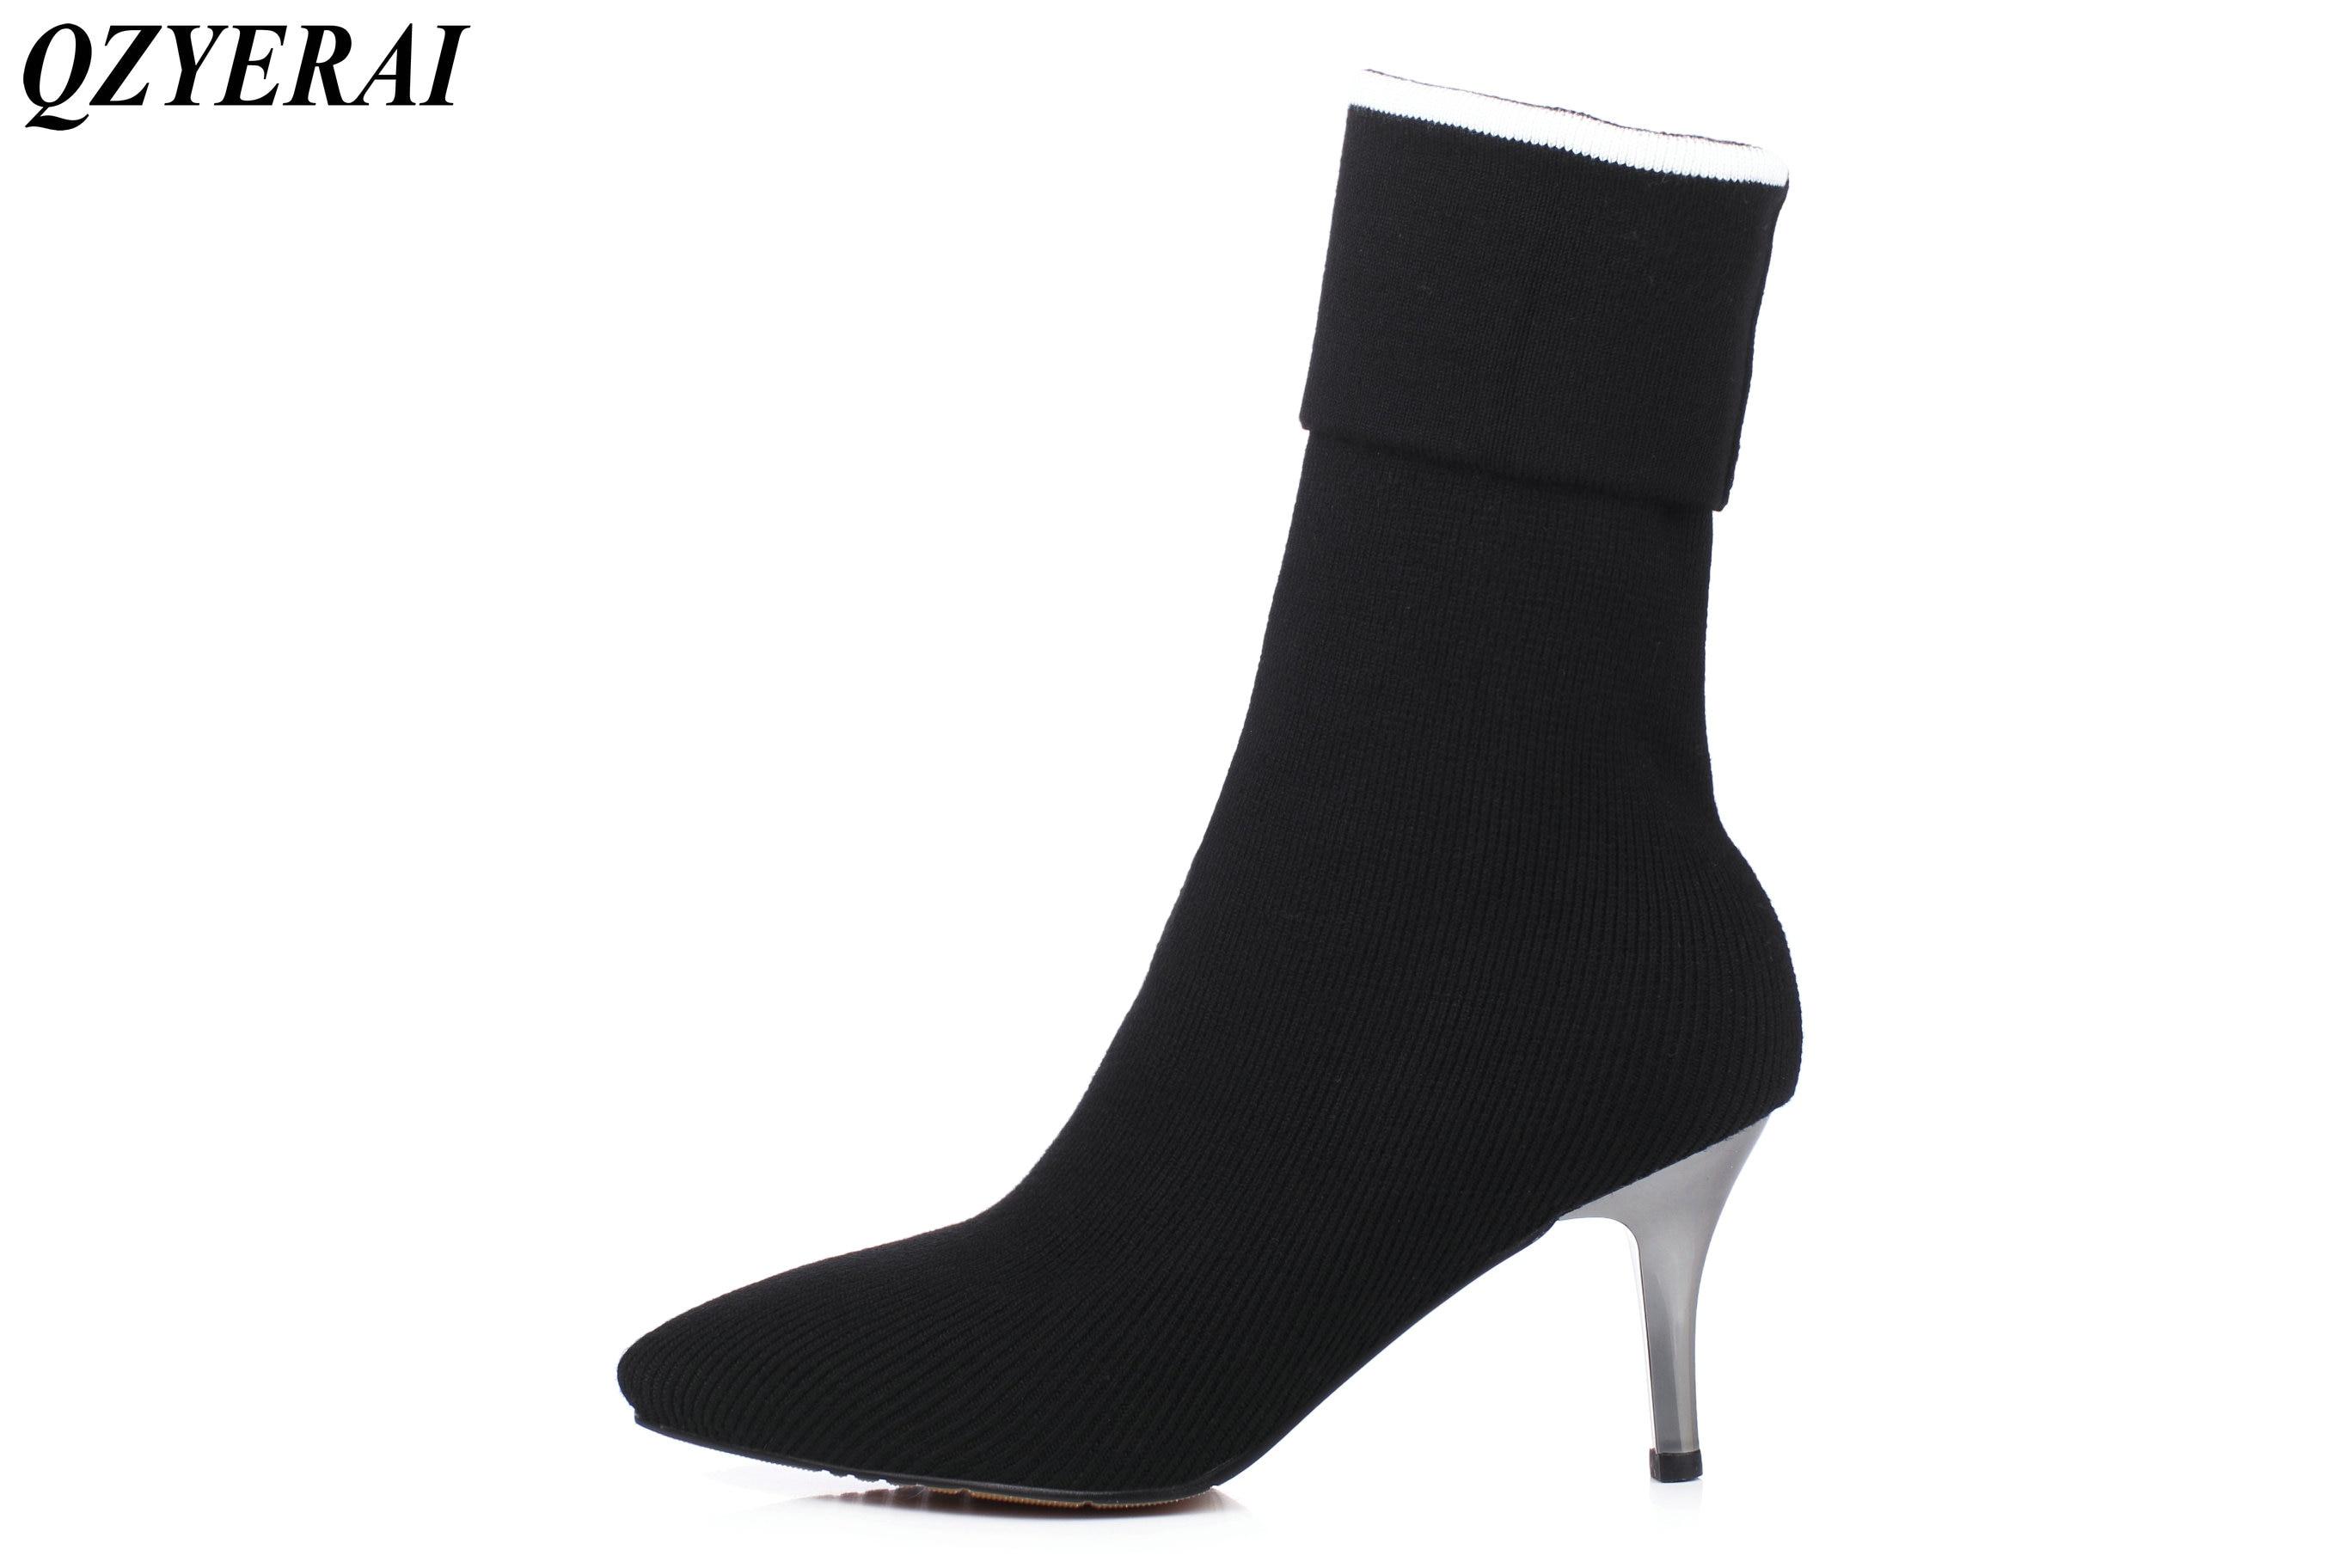 QZYERAI New arrivals European fashion new youth font b women b font medium boots casual font